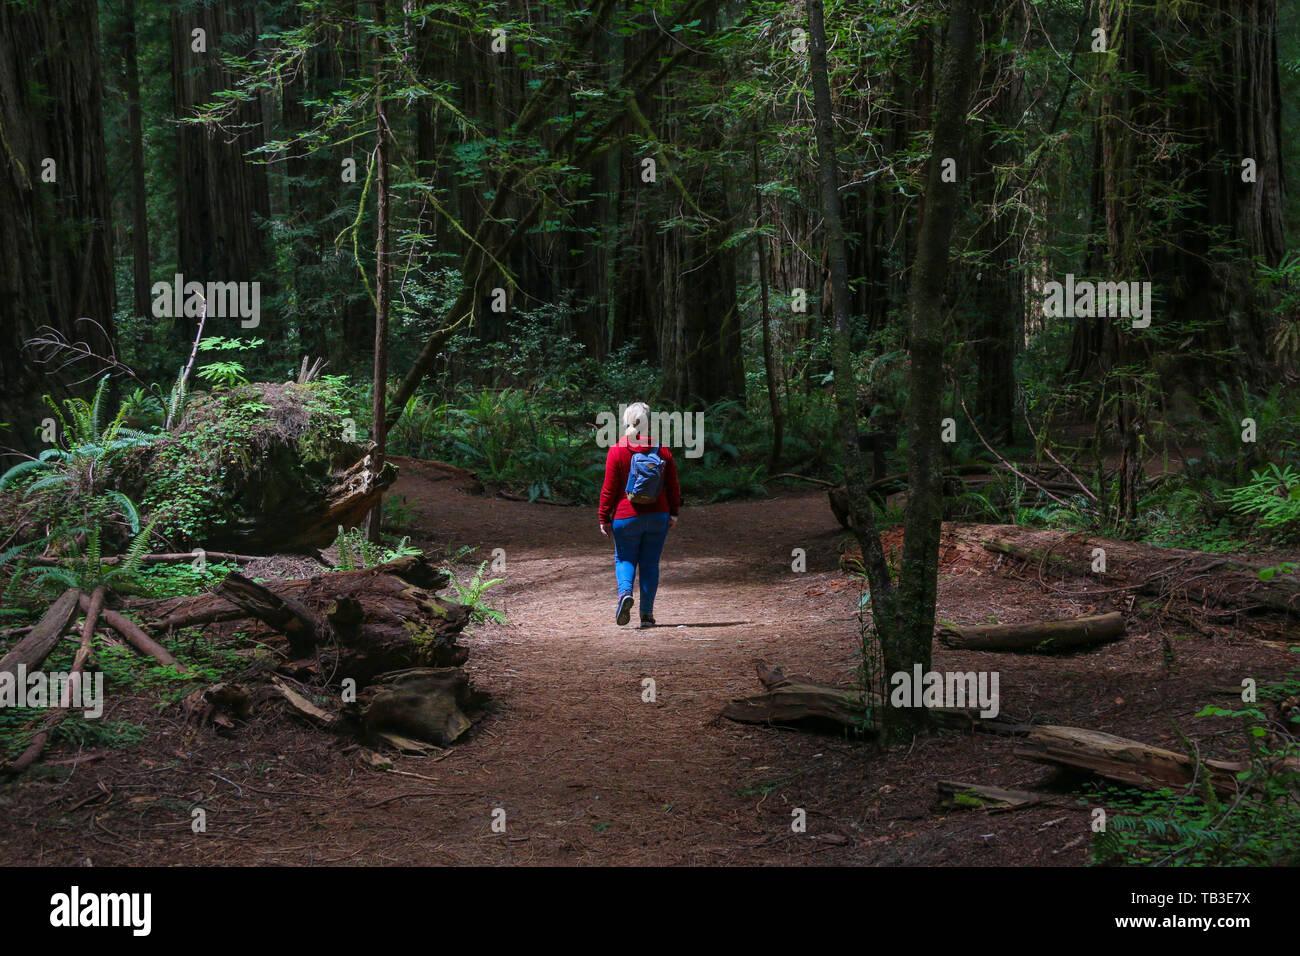 Stout Memorial Grove, California Redwoods - Stock Image